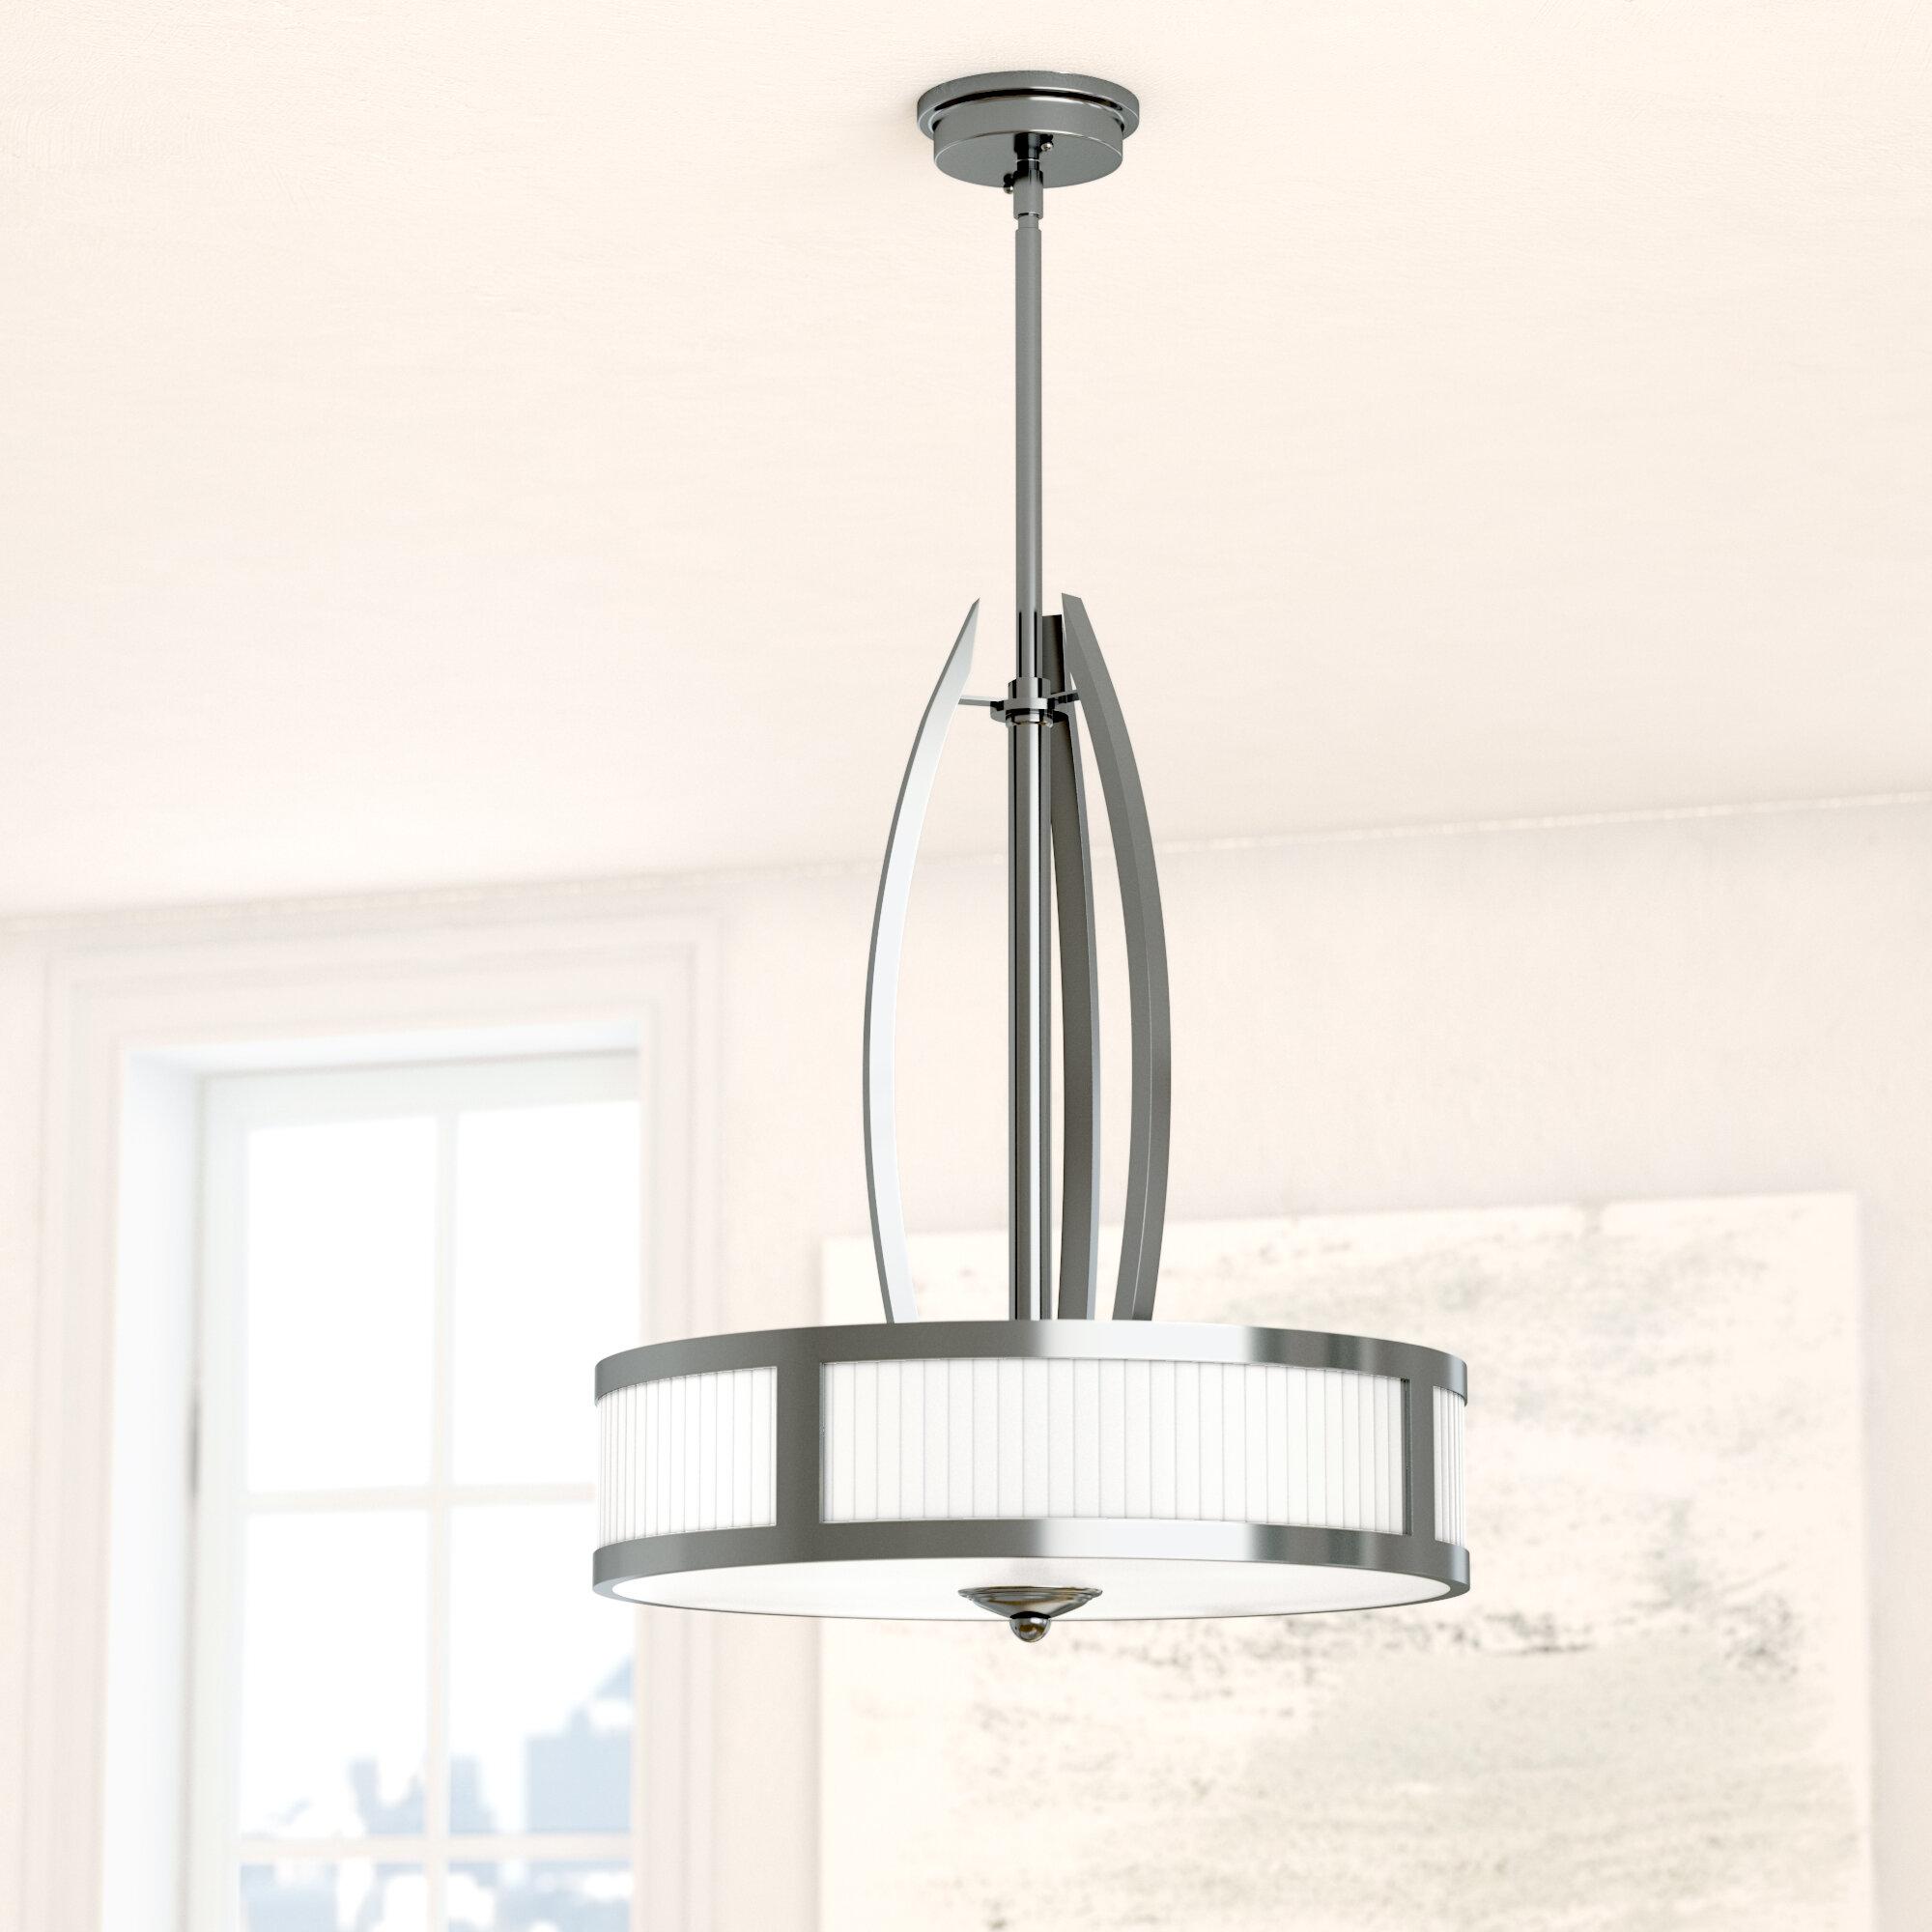 Hinkley lighting maurice 3 light drum chandelier wayfair